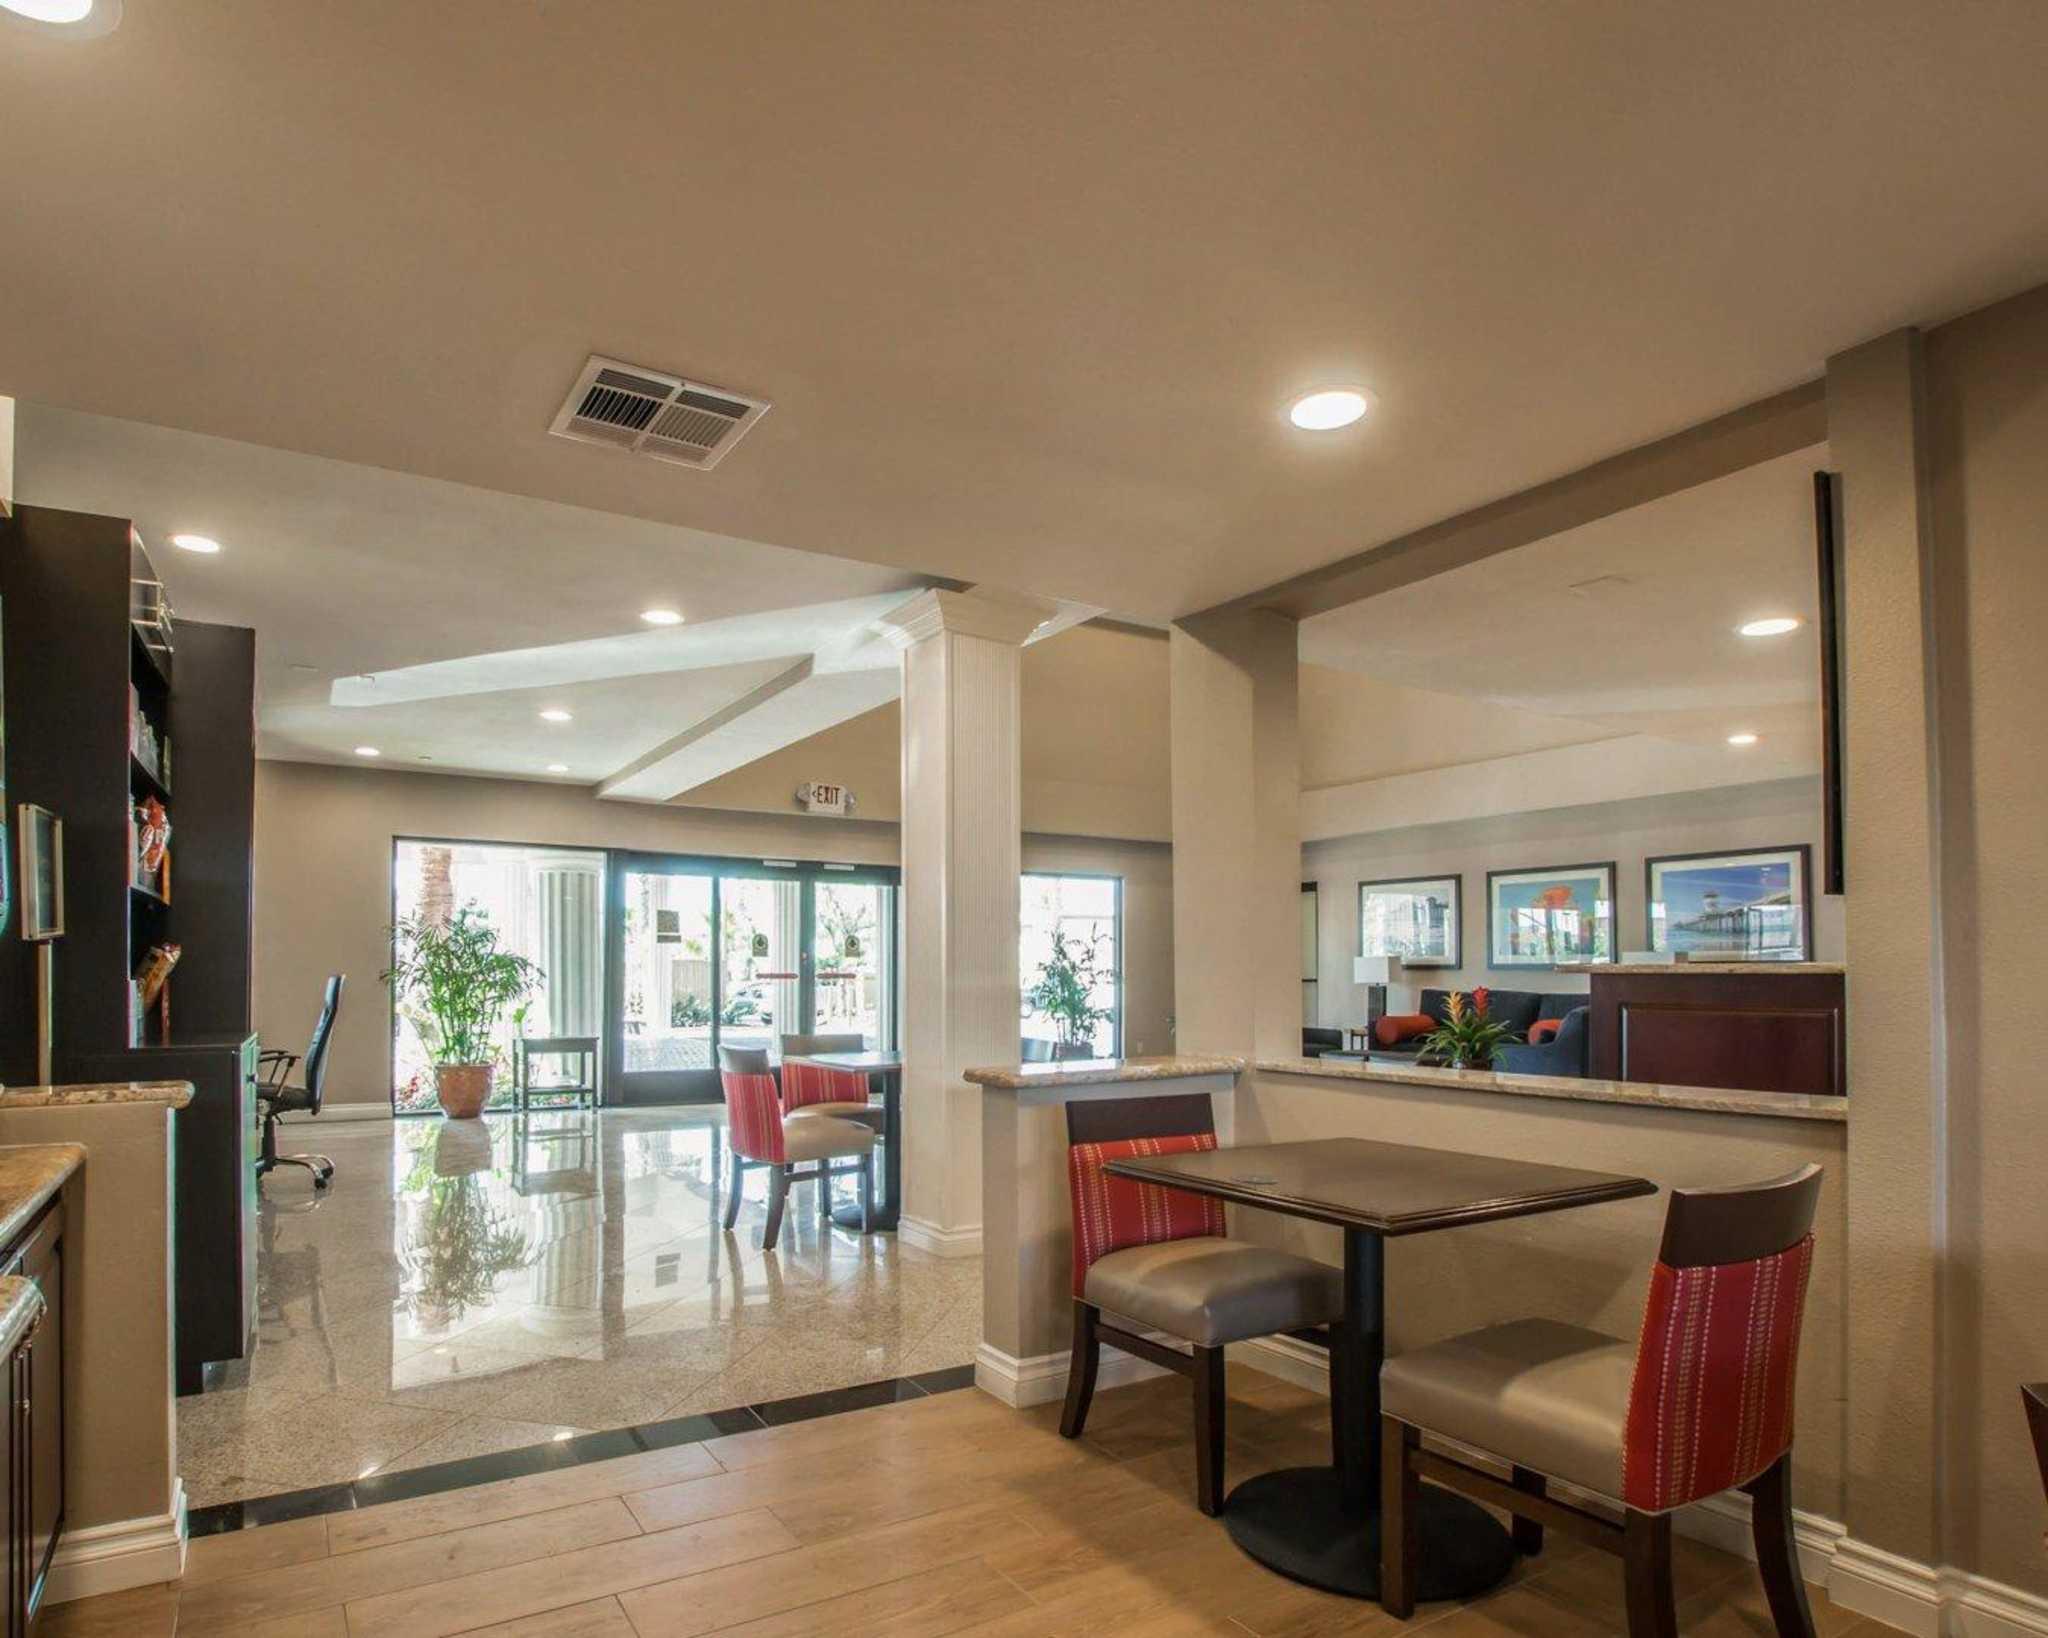 Comfort Suites Huntington Beach image 19